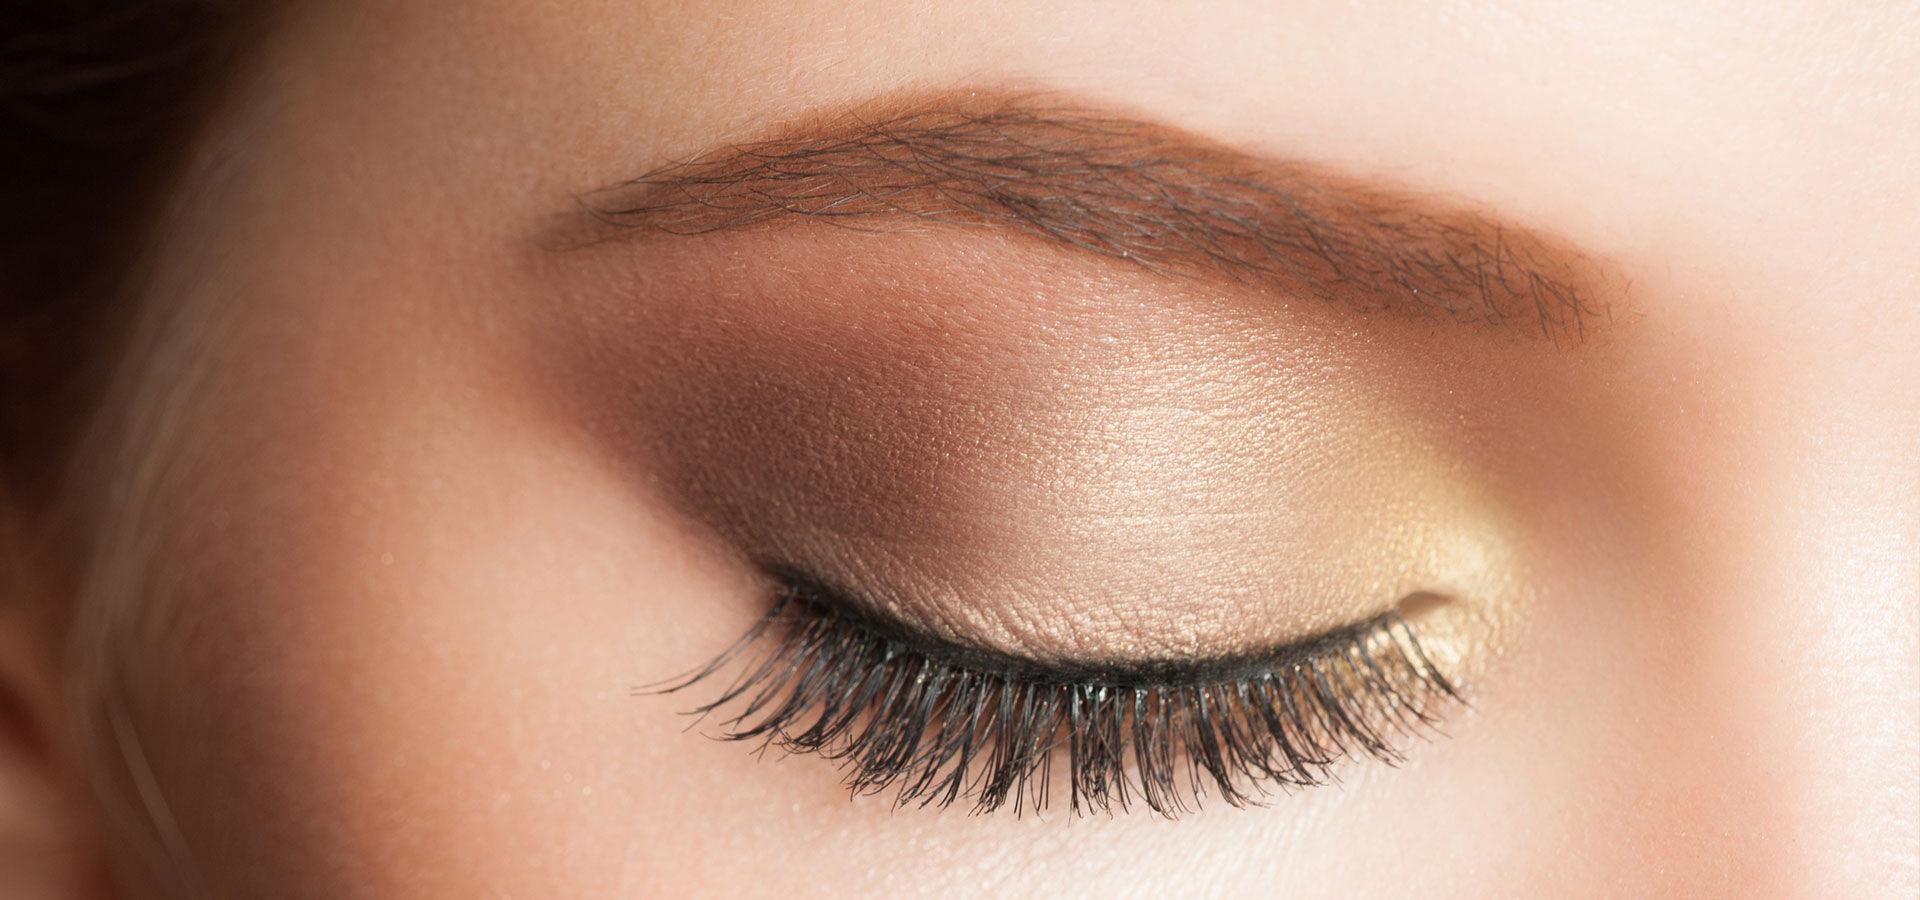 eyebrow tinting closed eye.jpg